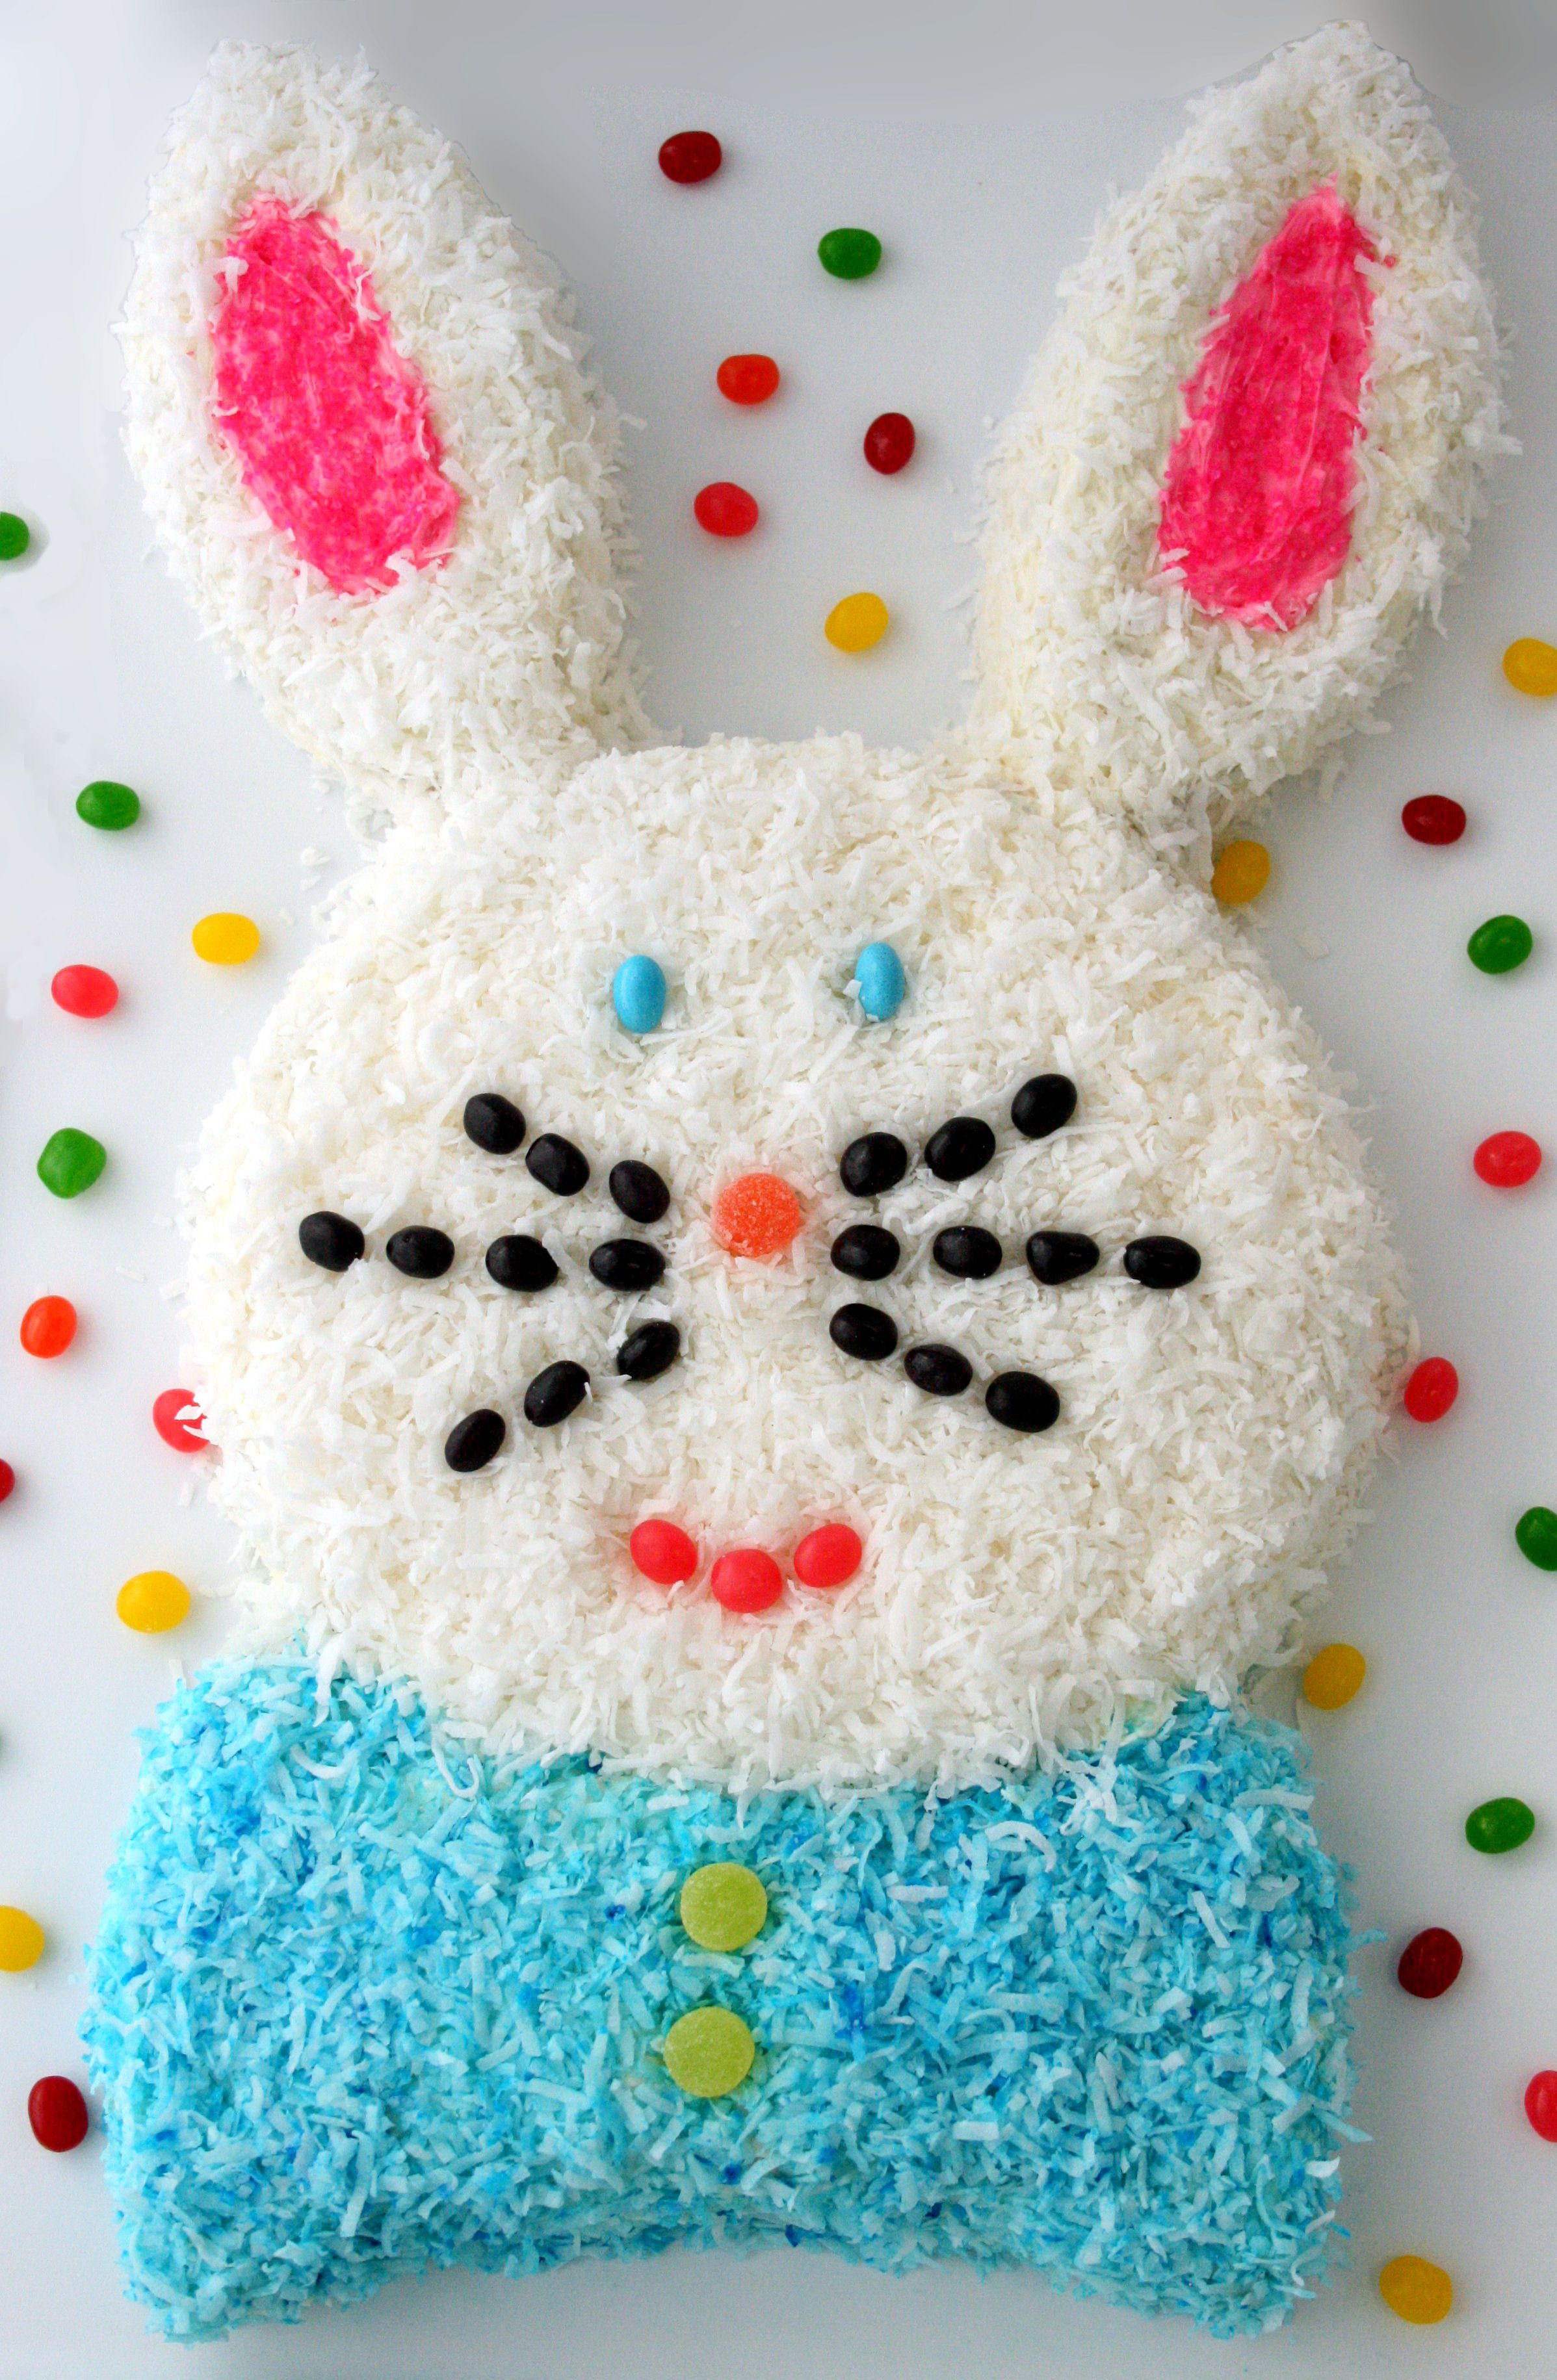 Bunny cake icing recipe